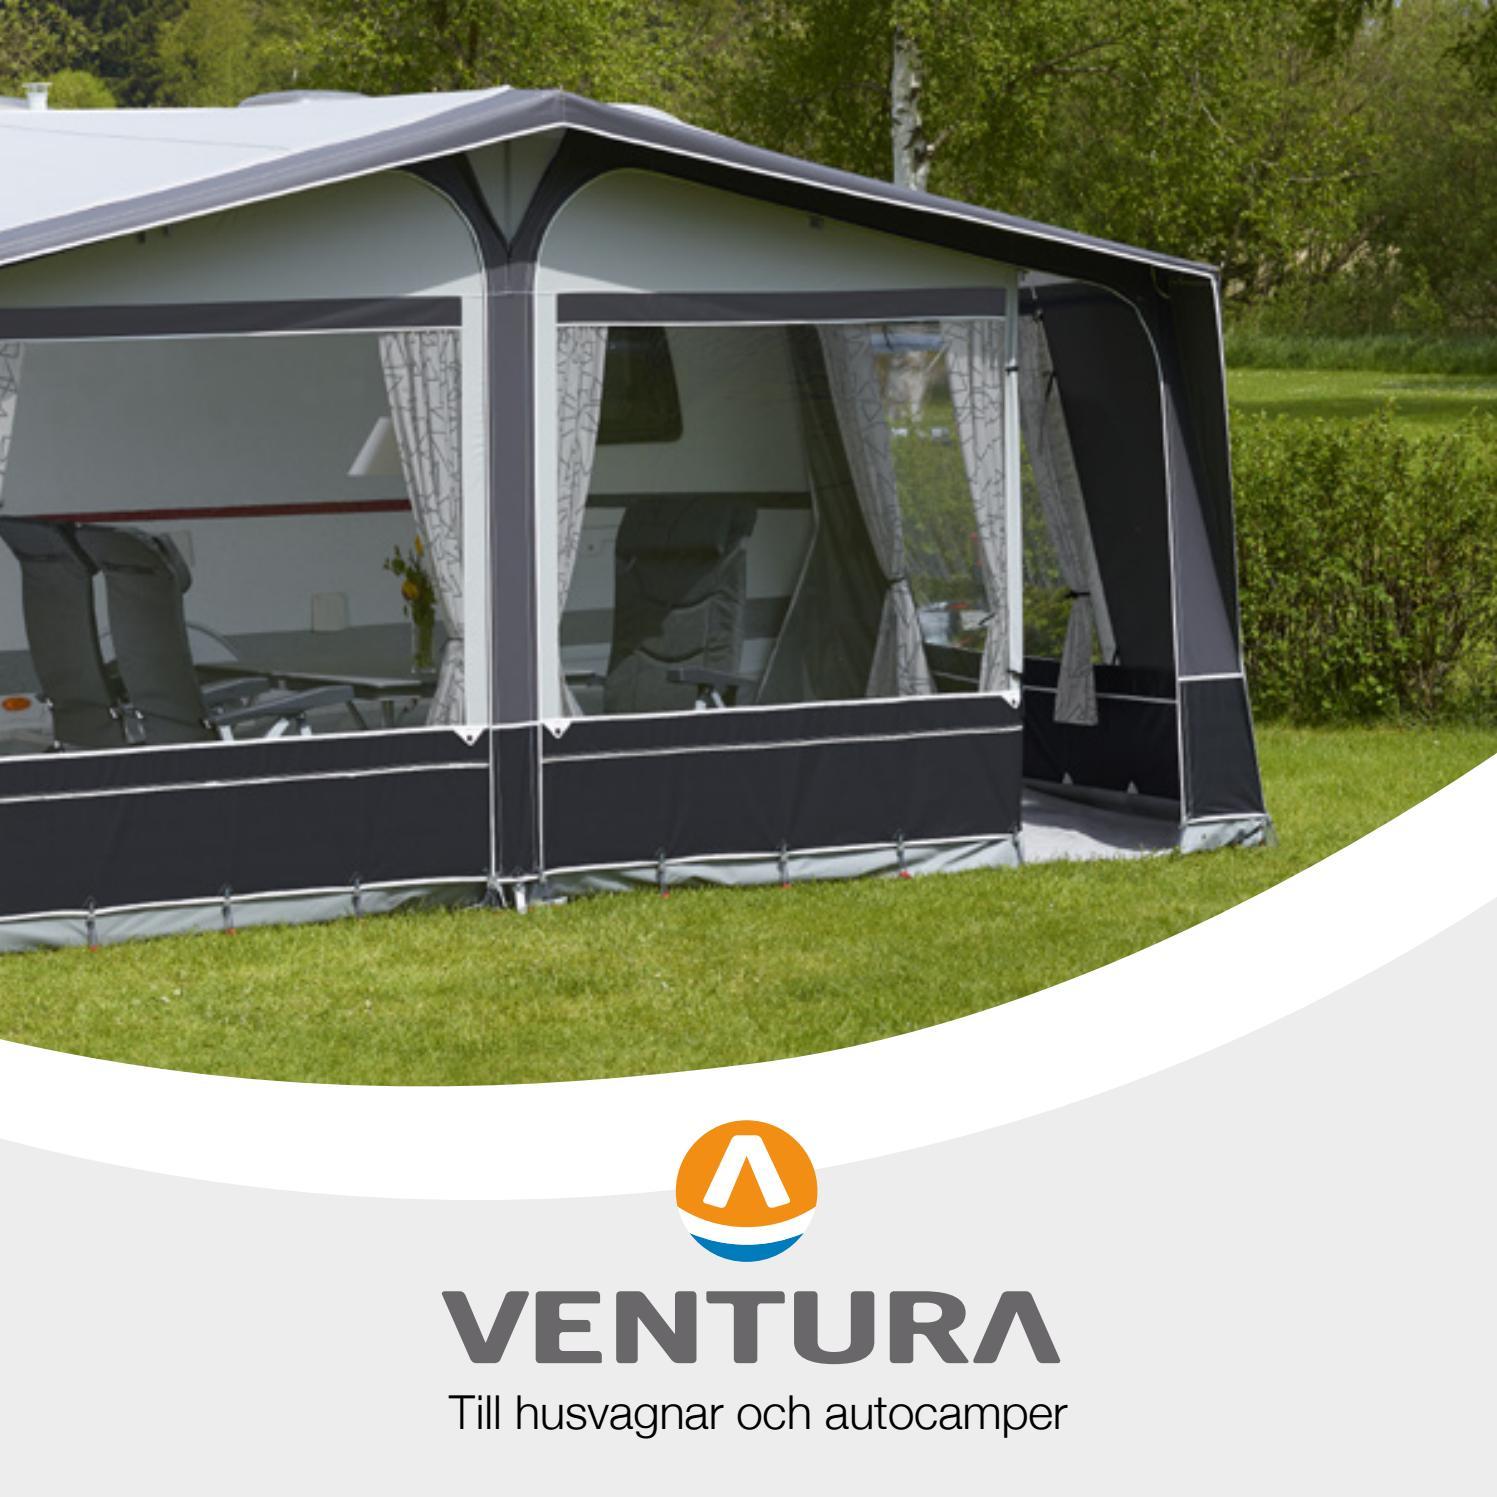 Ventura 2017 Sverige By Ventura Camping Issuu